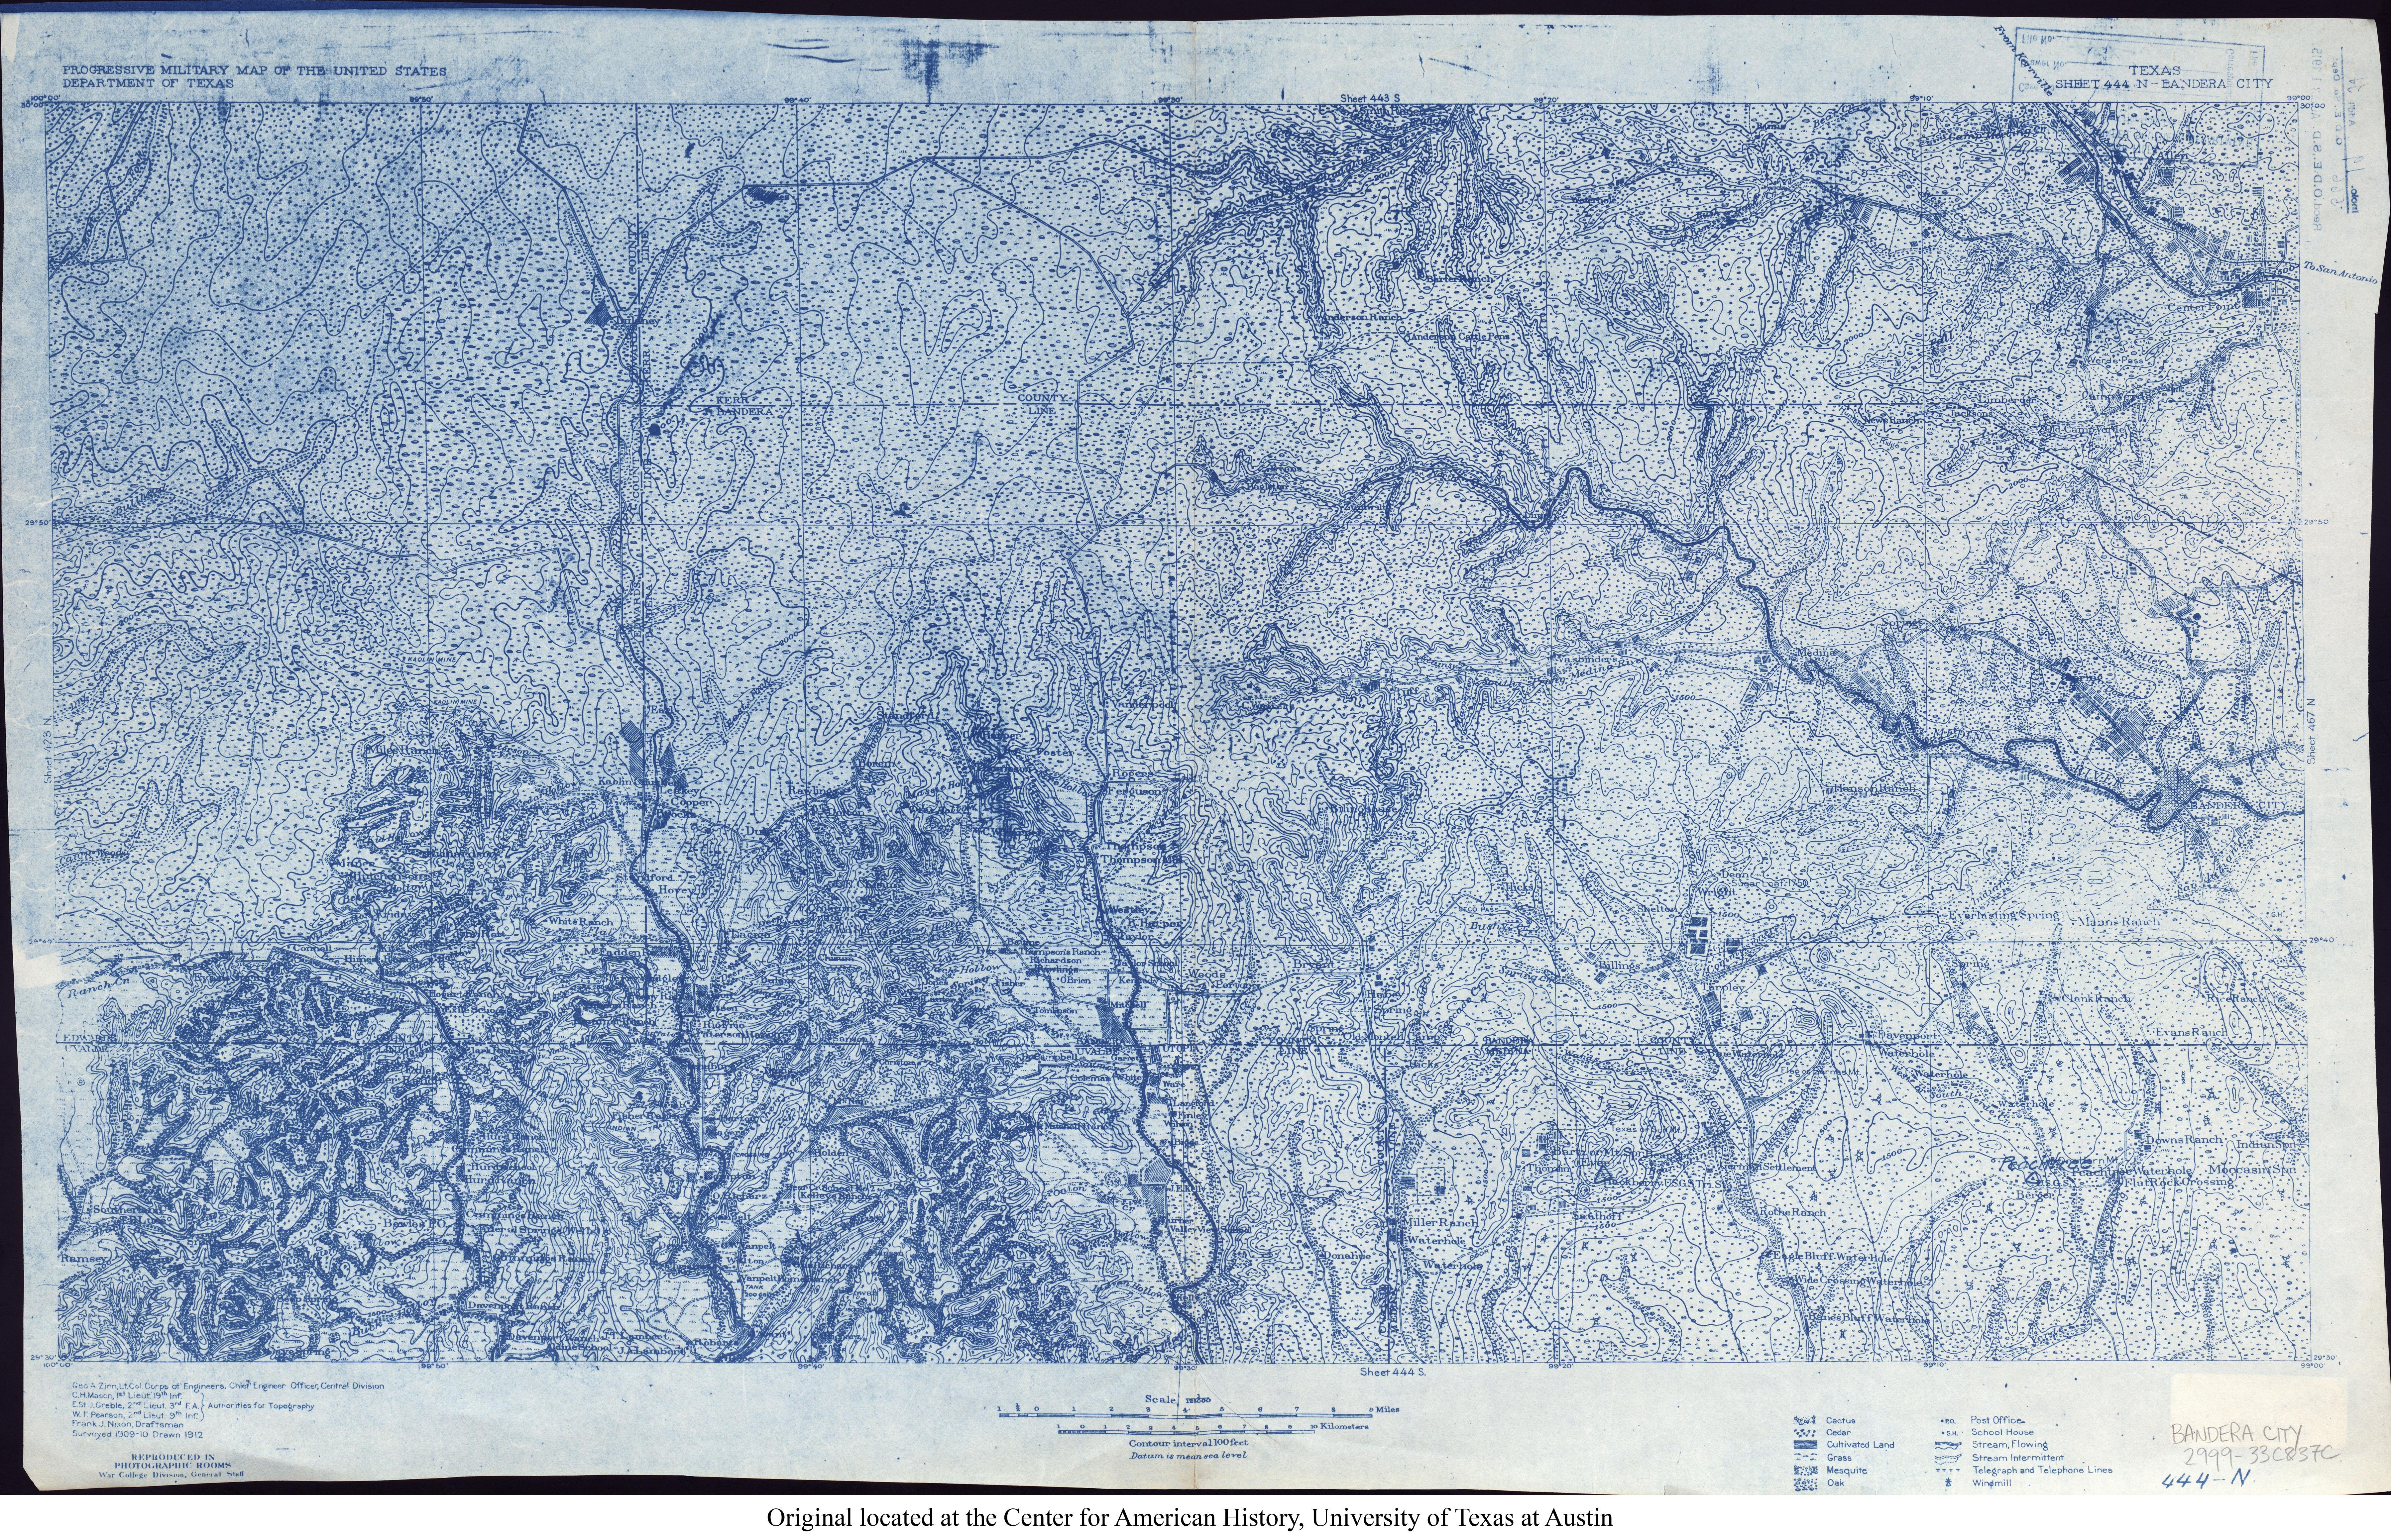 Worksheet. Texas Topographic Maps  PerryCastaeda Map Collection  UT